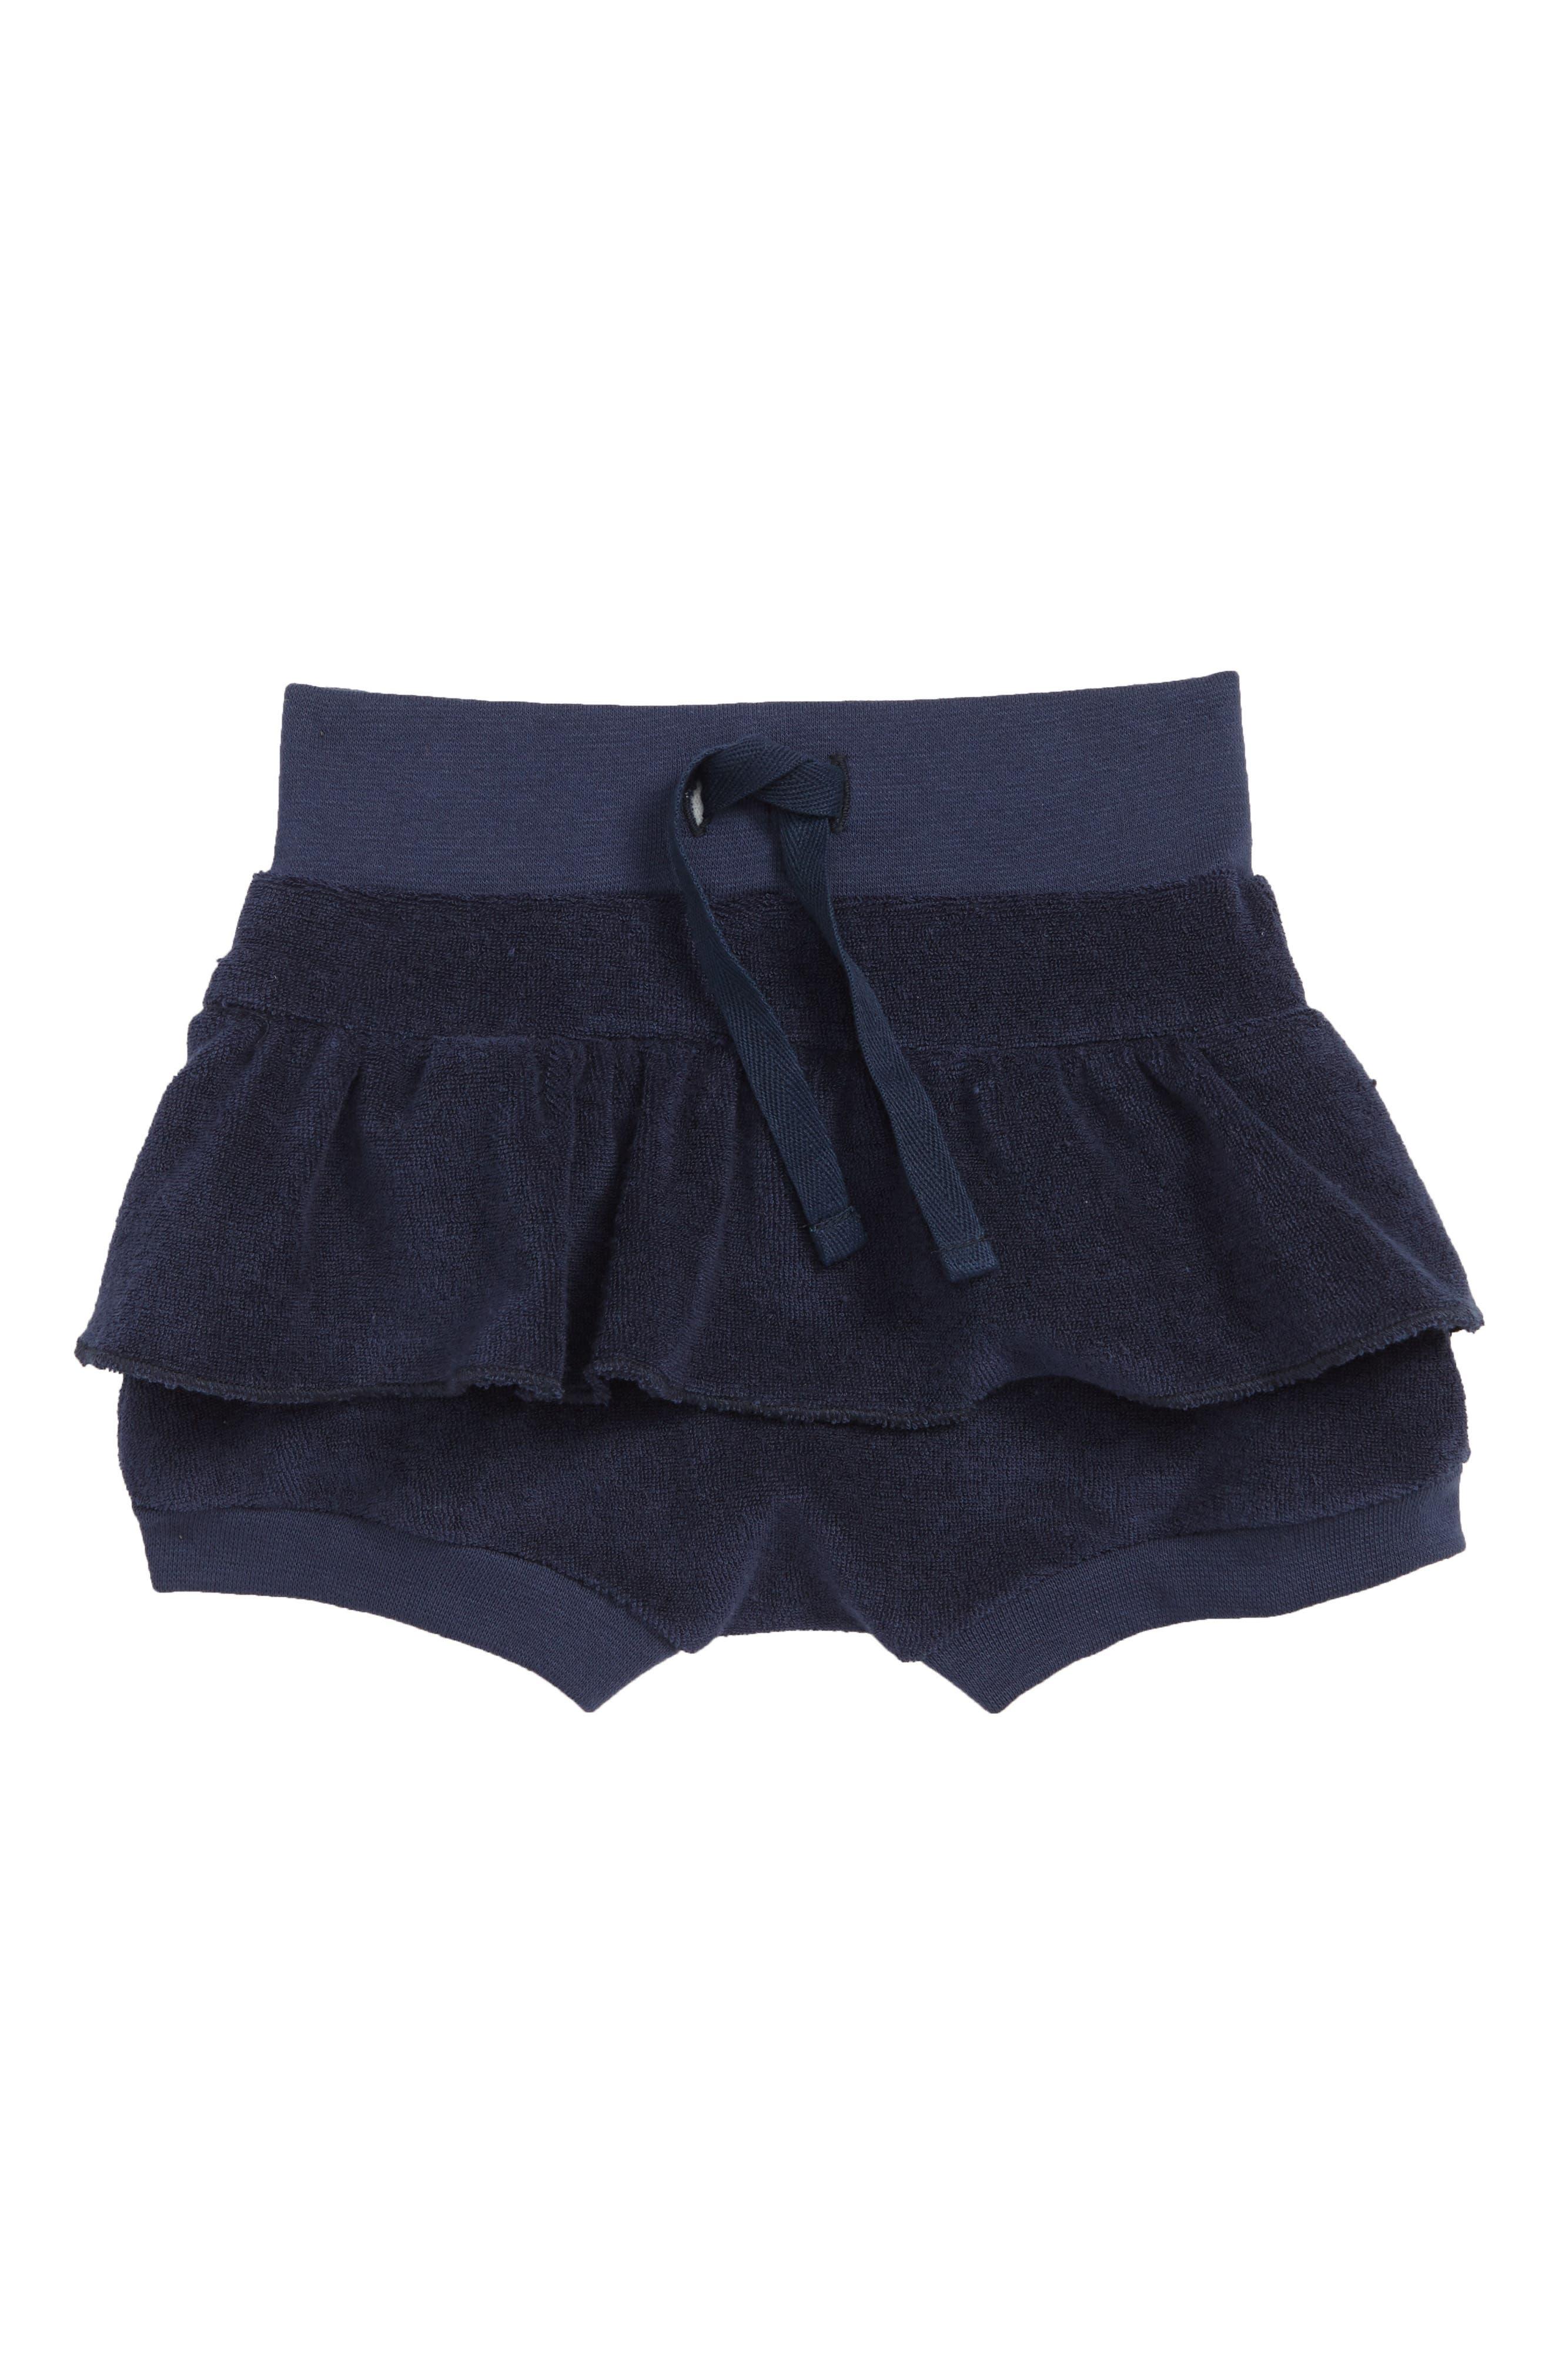 Frill Organic Cotton Beach Shorts,                             Main thumbnail 1, color,                             400